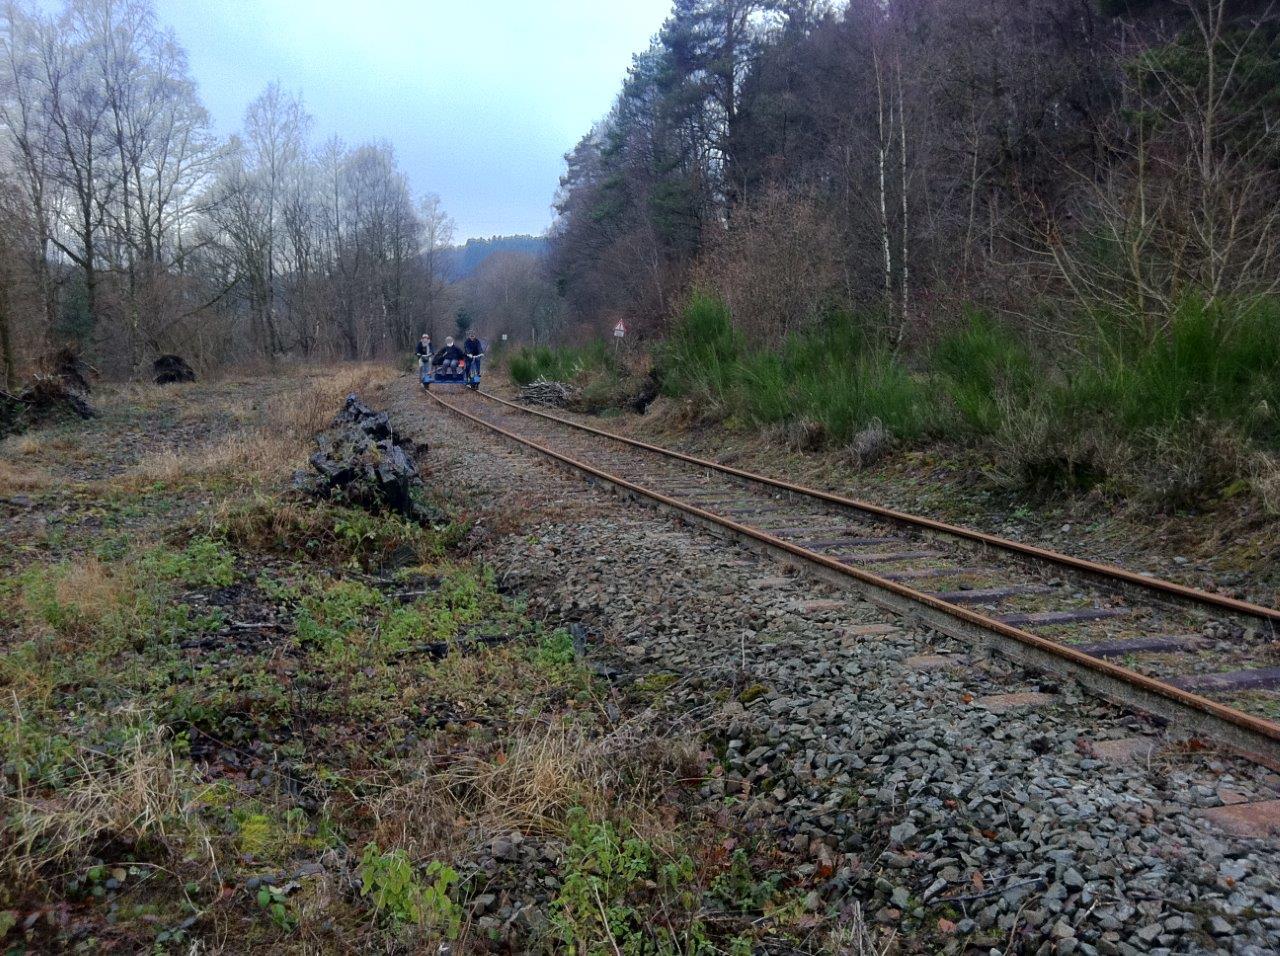 2016-12-28-fotos-winterfahrt-lueling-ma-01